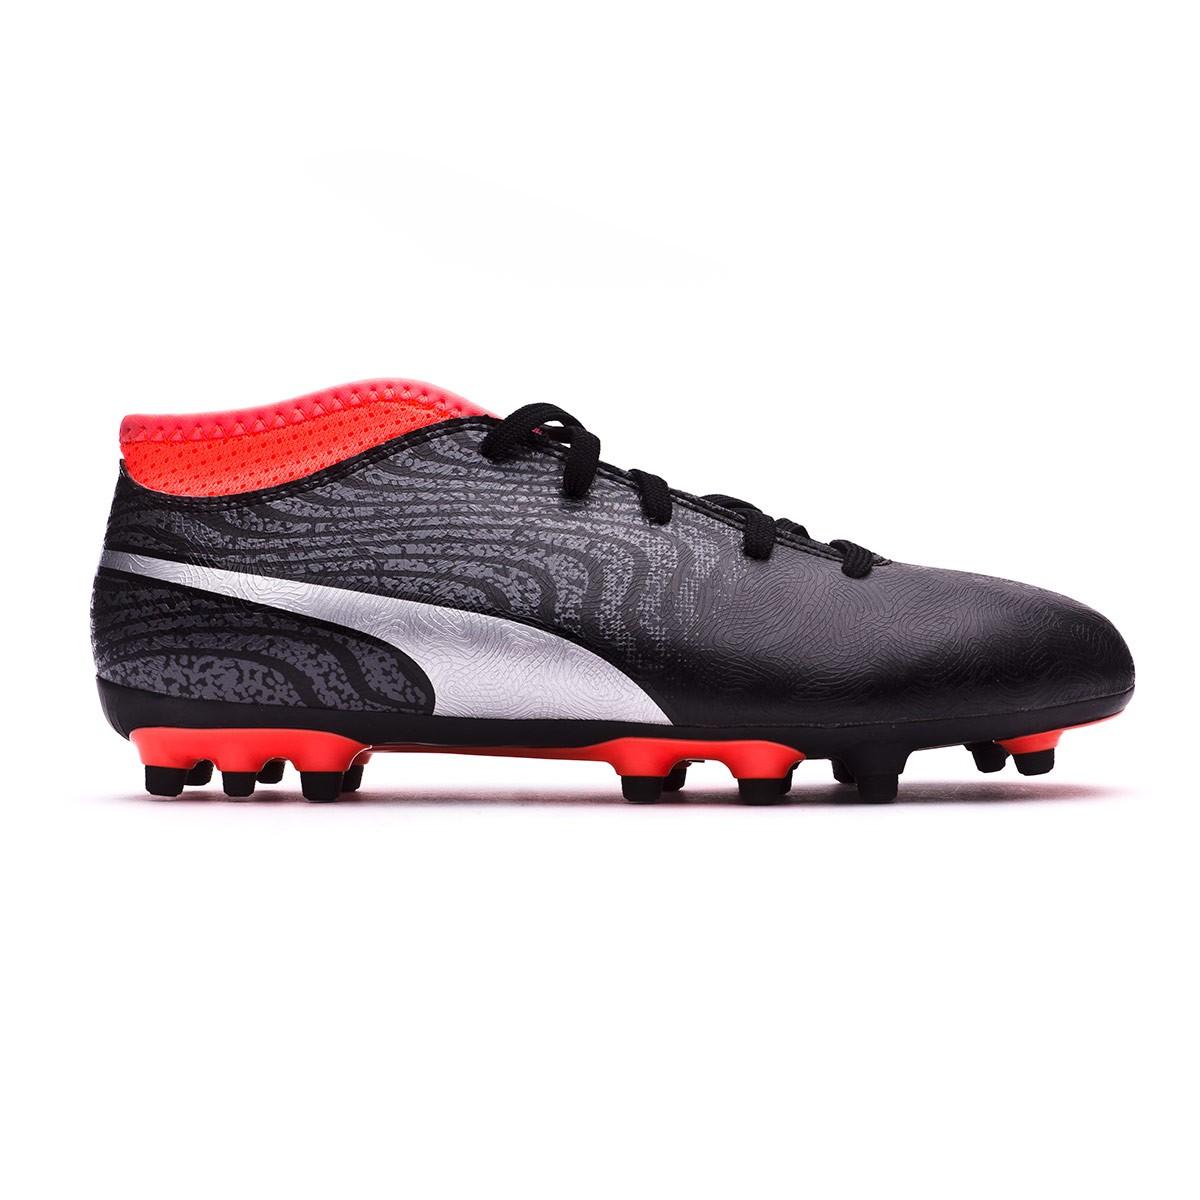 ... Bota One 18.4 AG Niño Puma Black-Puma Silver-Red Blast. Categorías de  la Bota de fútbol. Botas de fútbol b214619ad1802